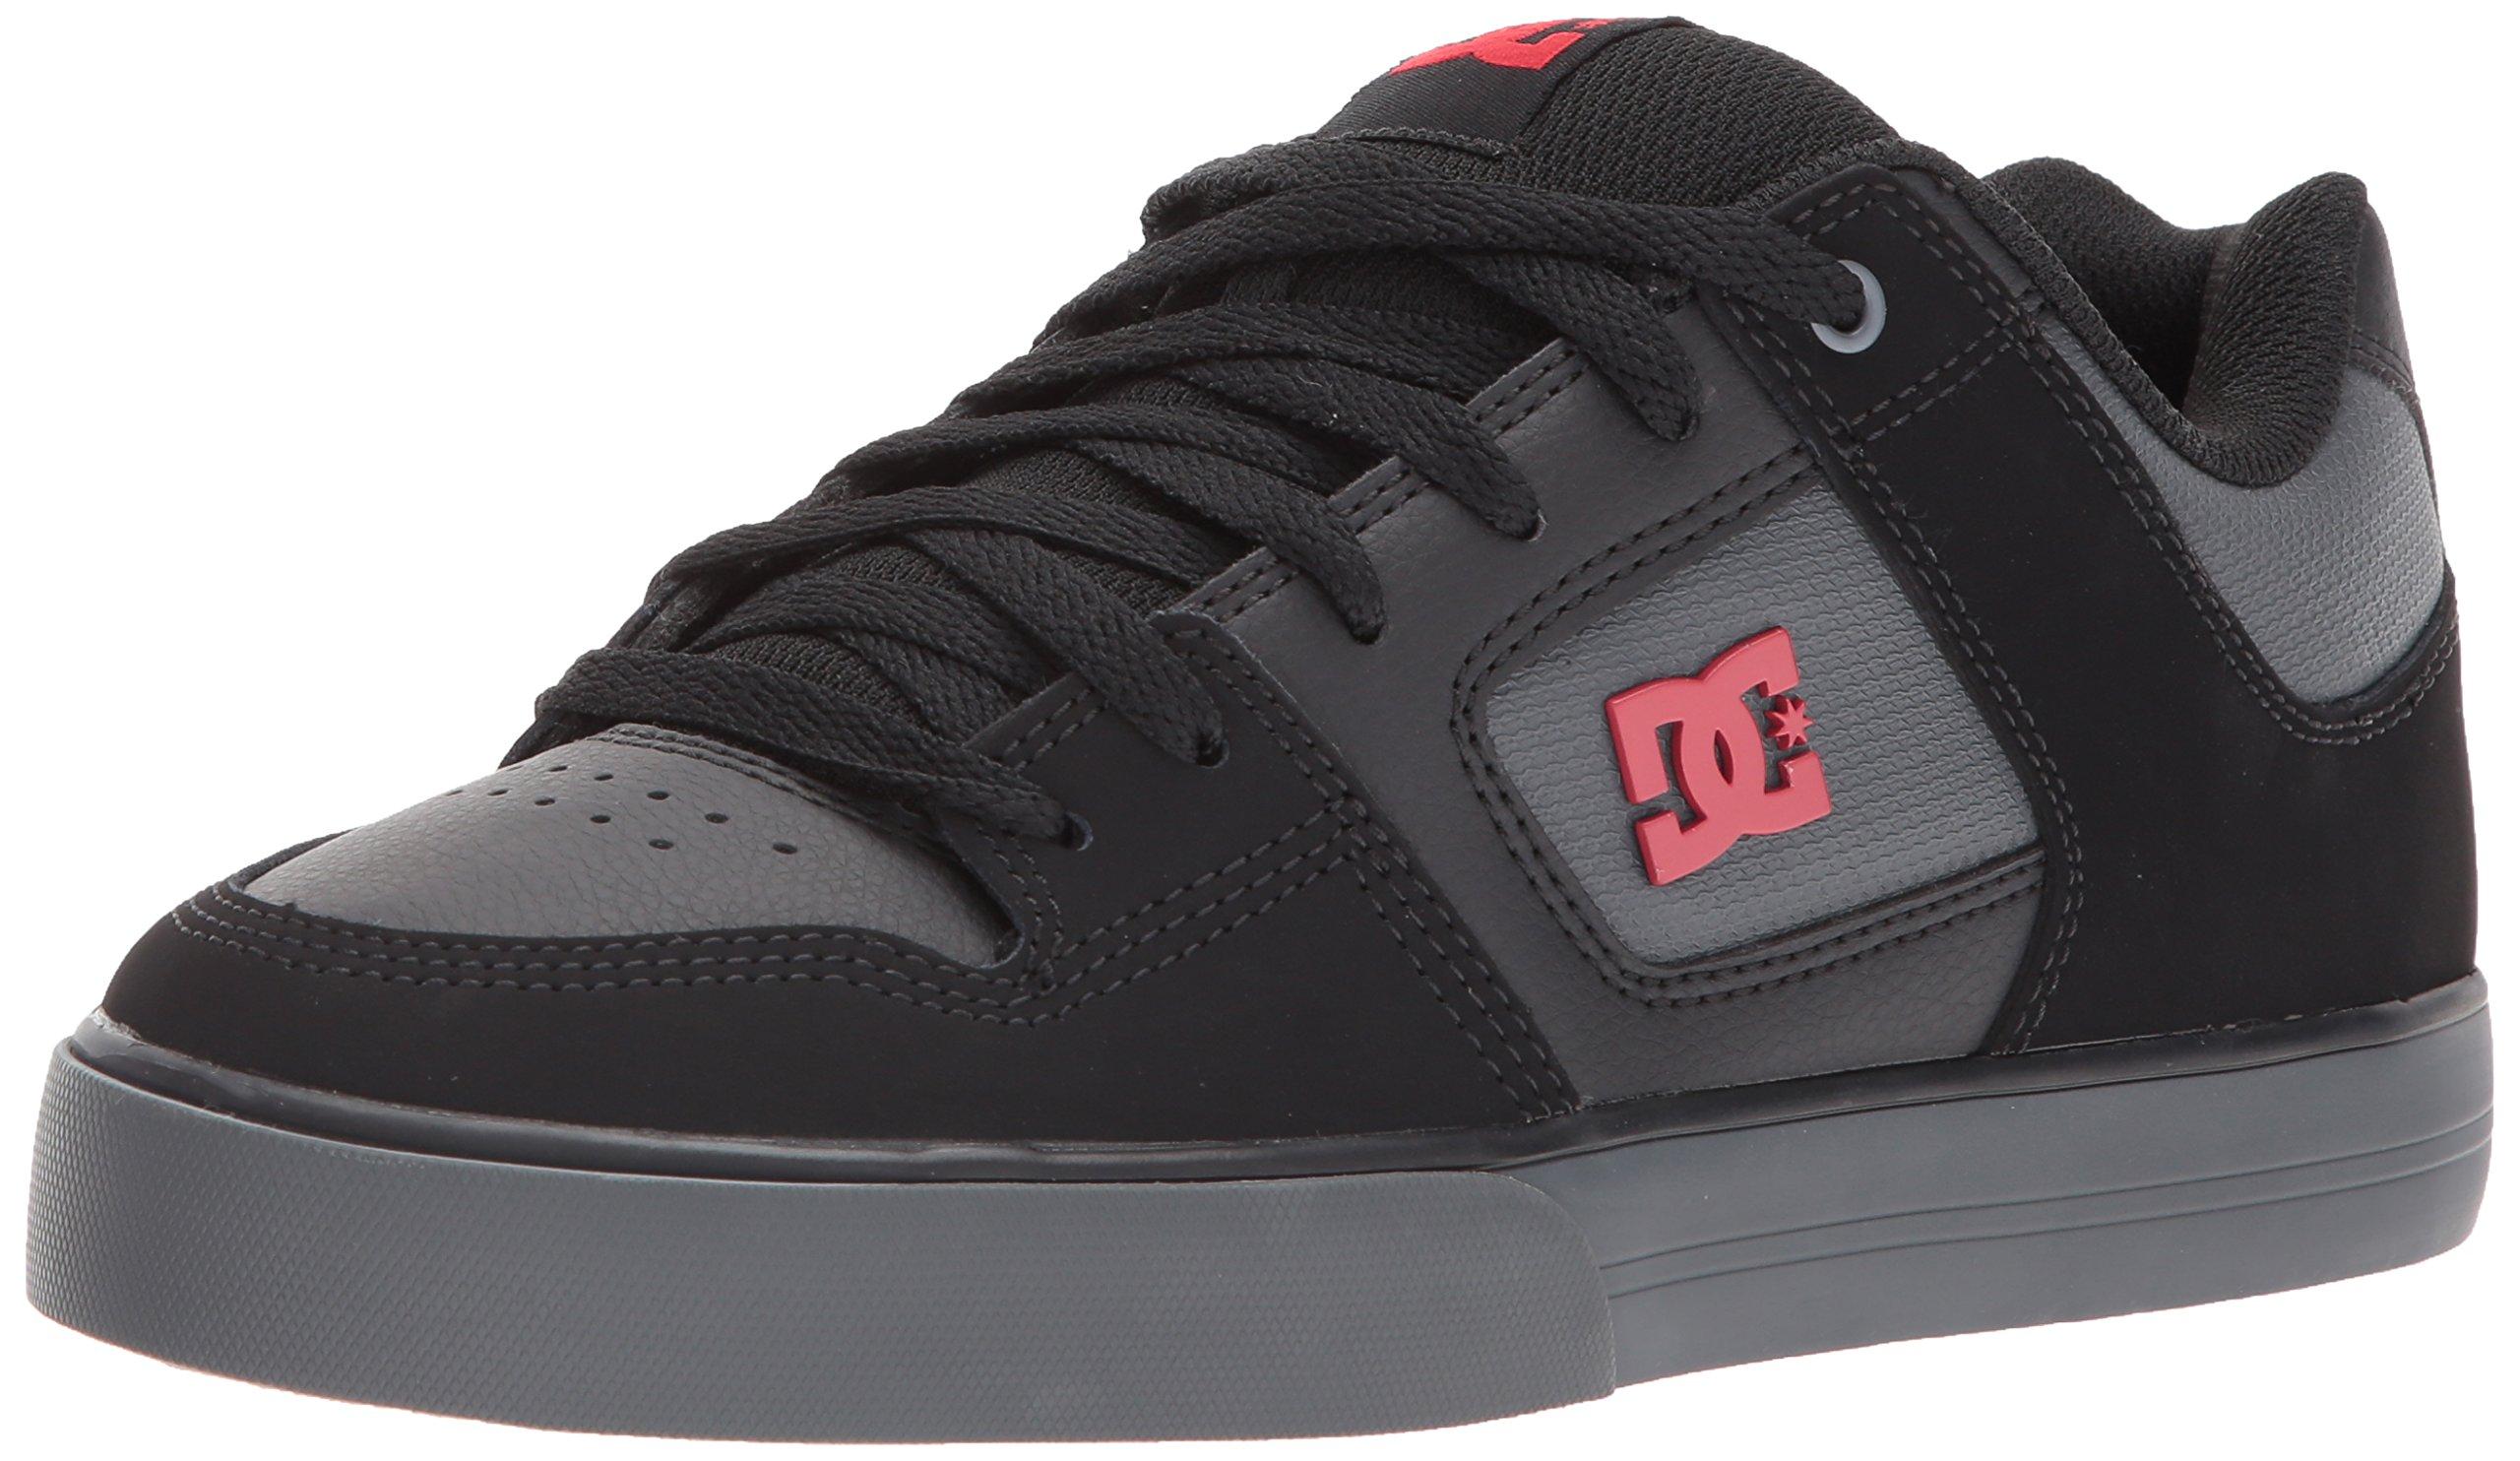 DC Men's Pure SE Skate Shoe, Dark Shadow/True Red, 10 D D US